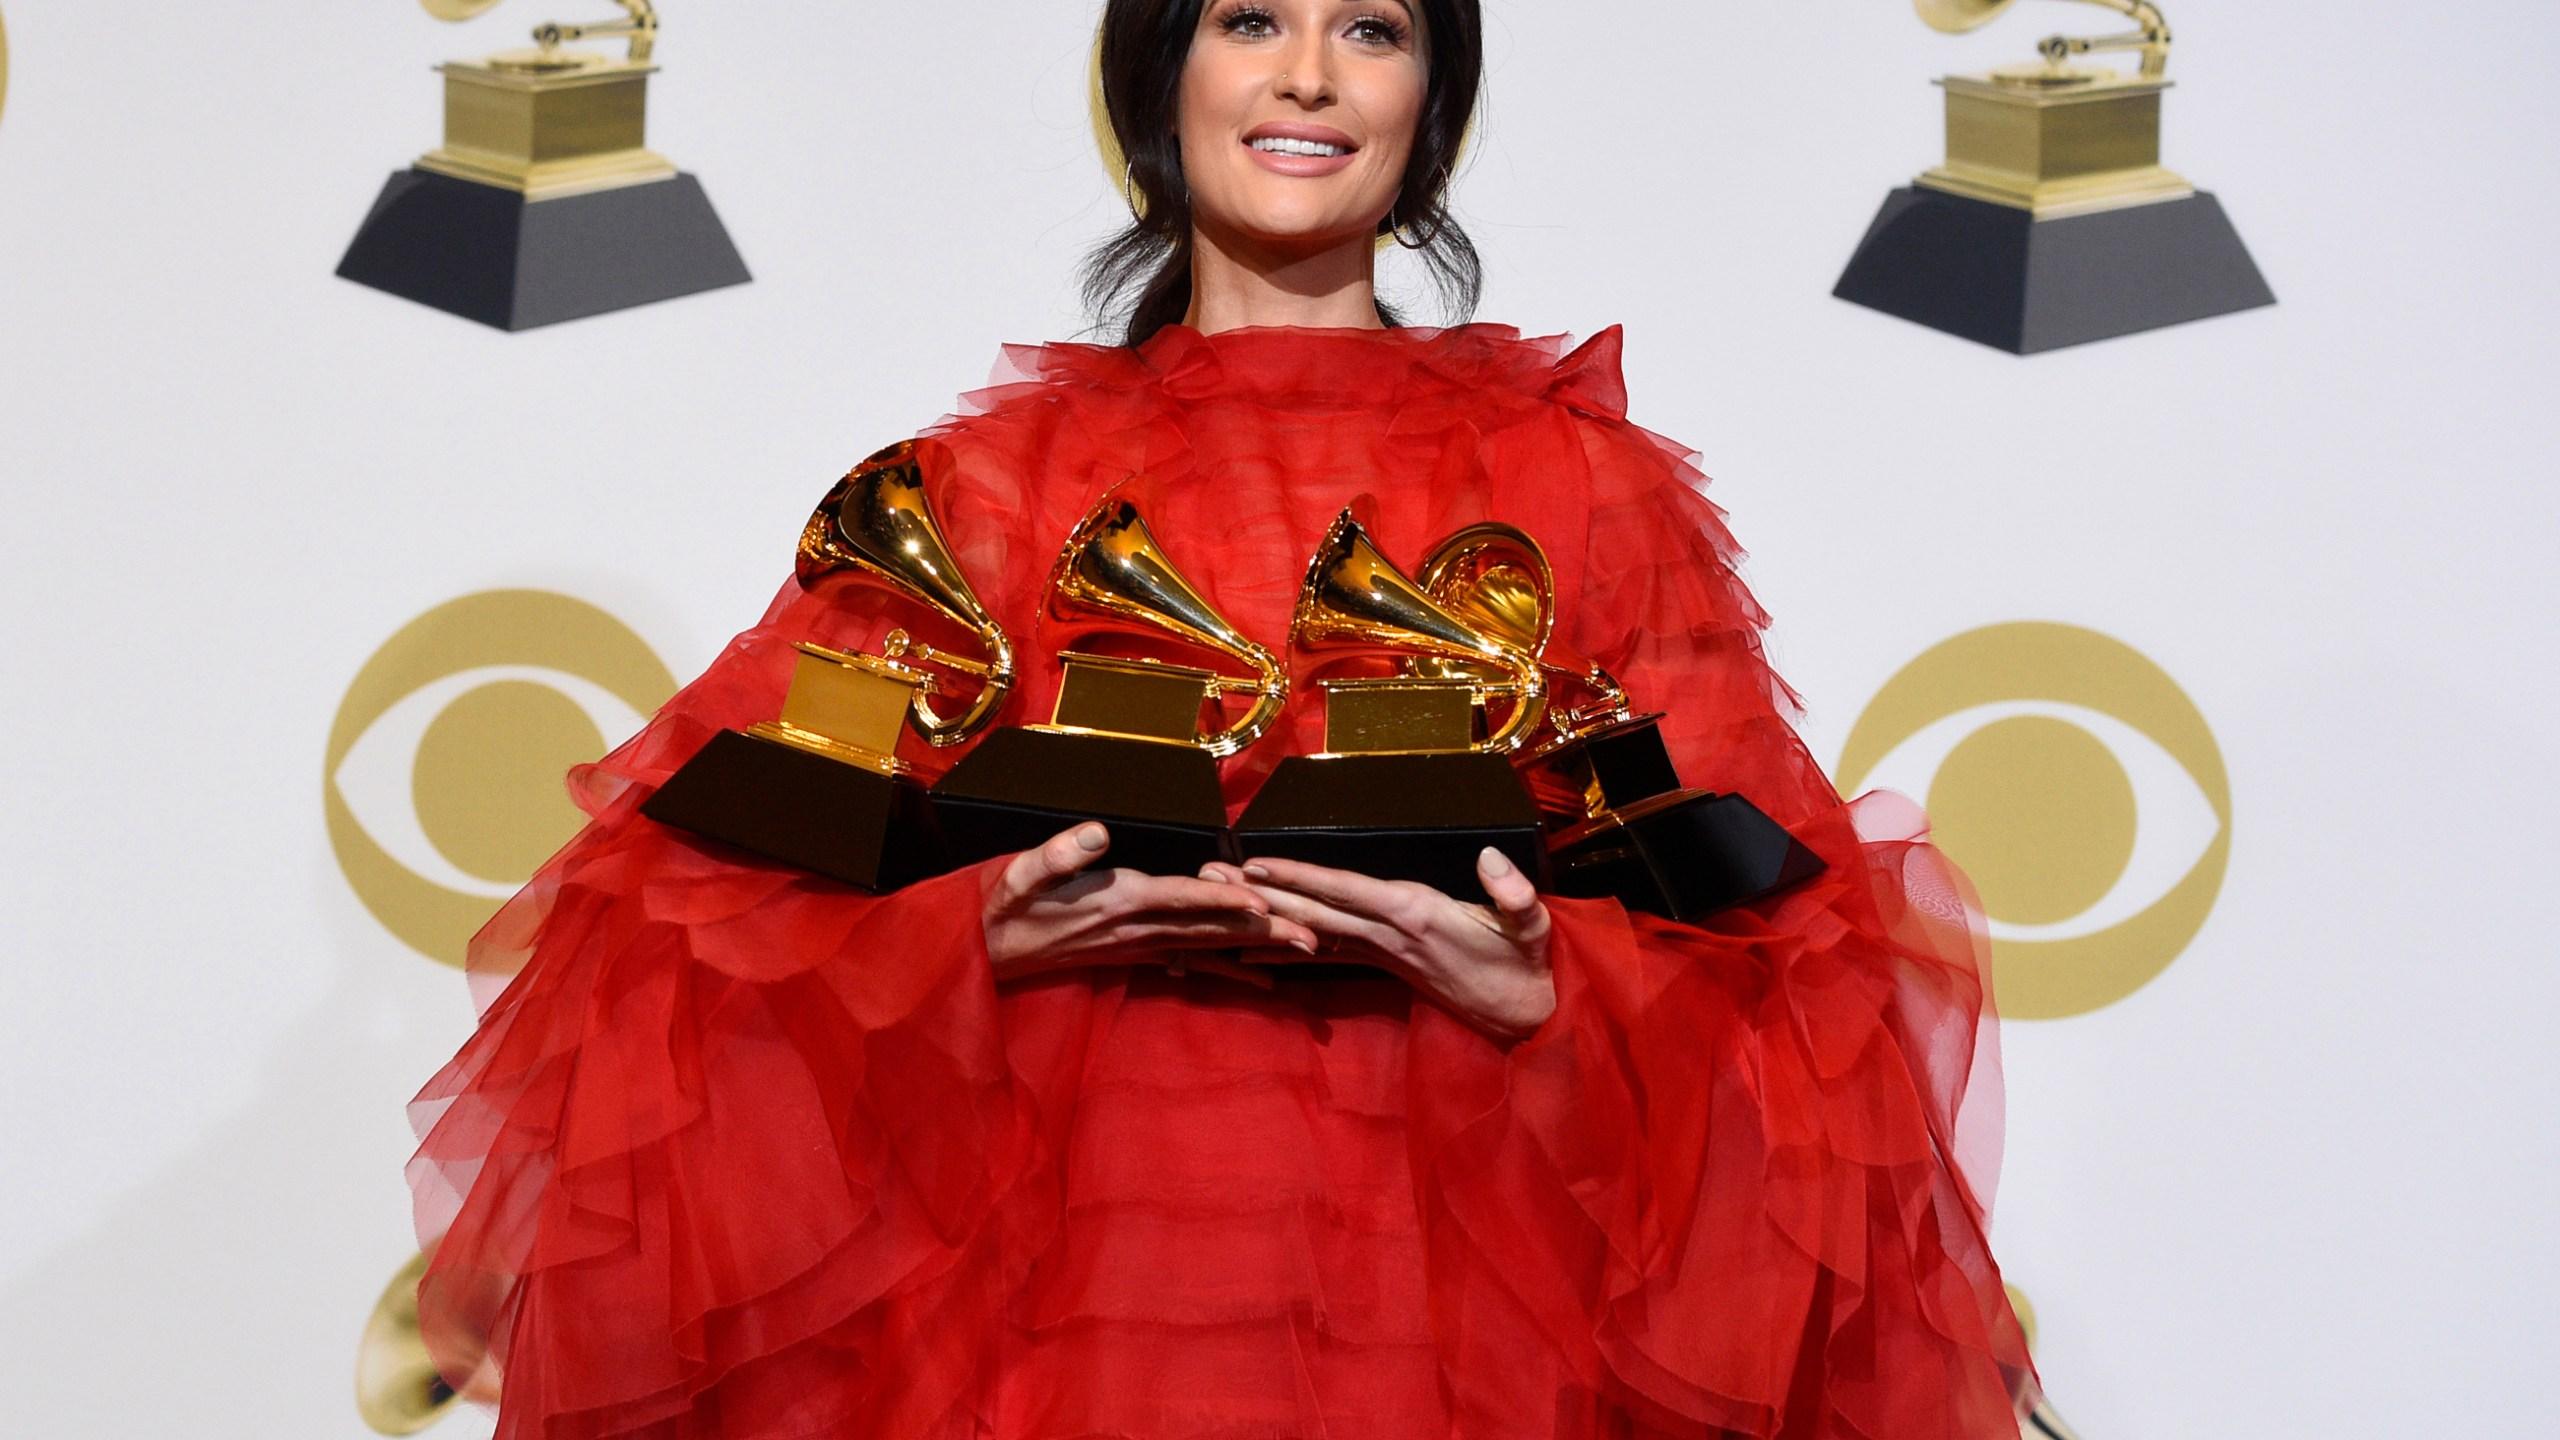 Music_ACM_Awards_81580-159532.jpg88401405